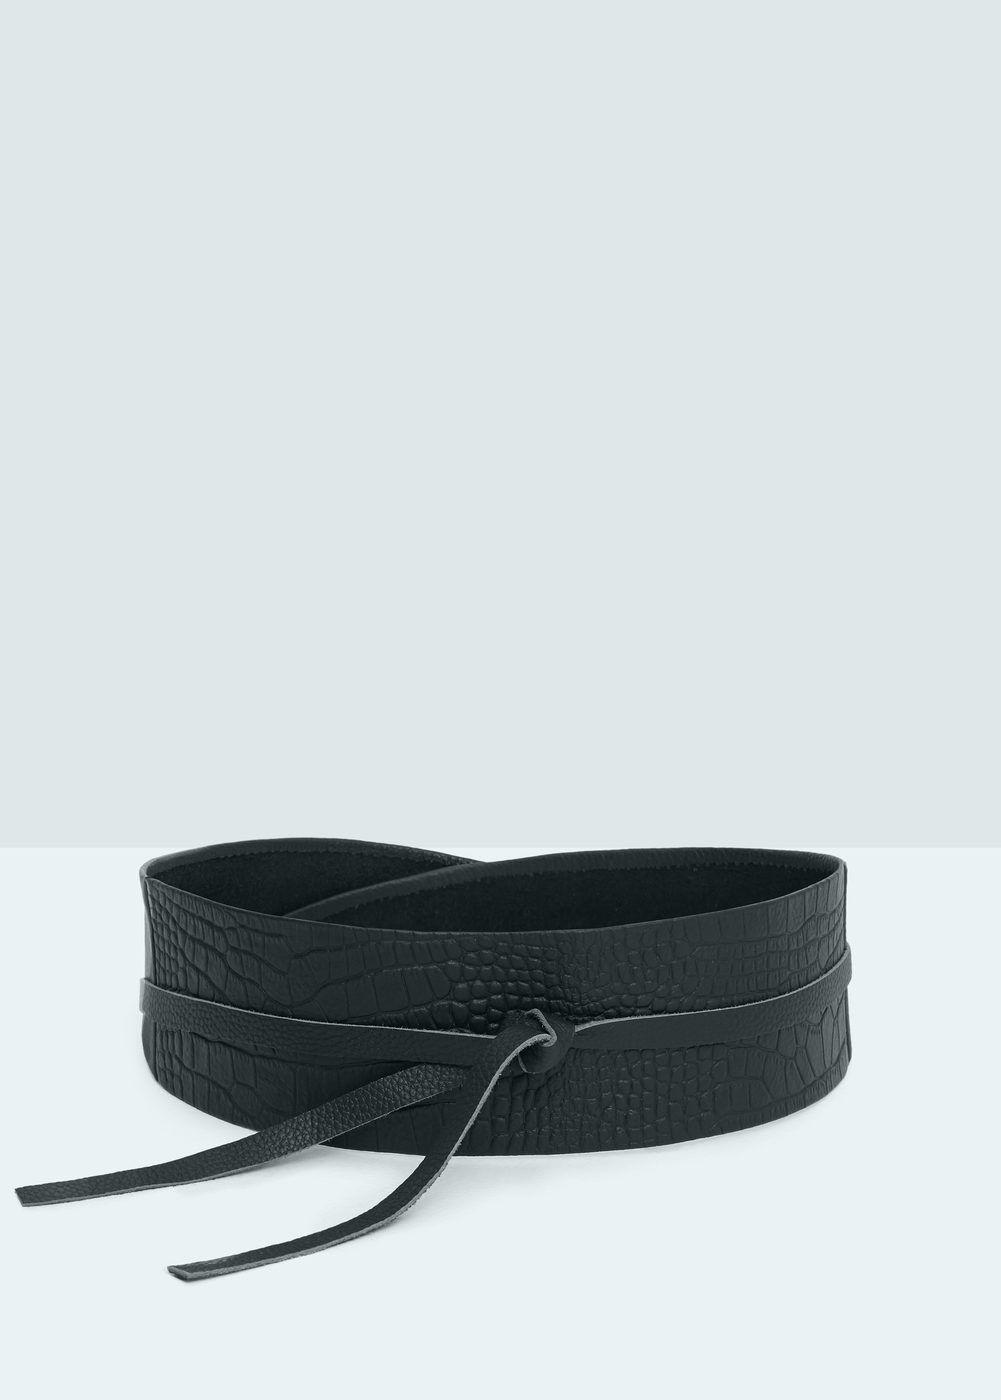 acquisto economico 94aac d91fb Cintura fusciacca pelle - Donna | Fusciacca | Obi belt, Belt ...